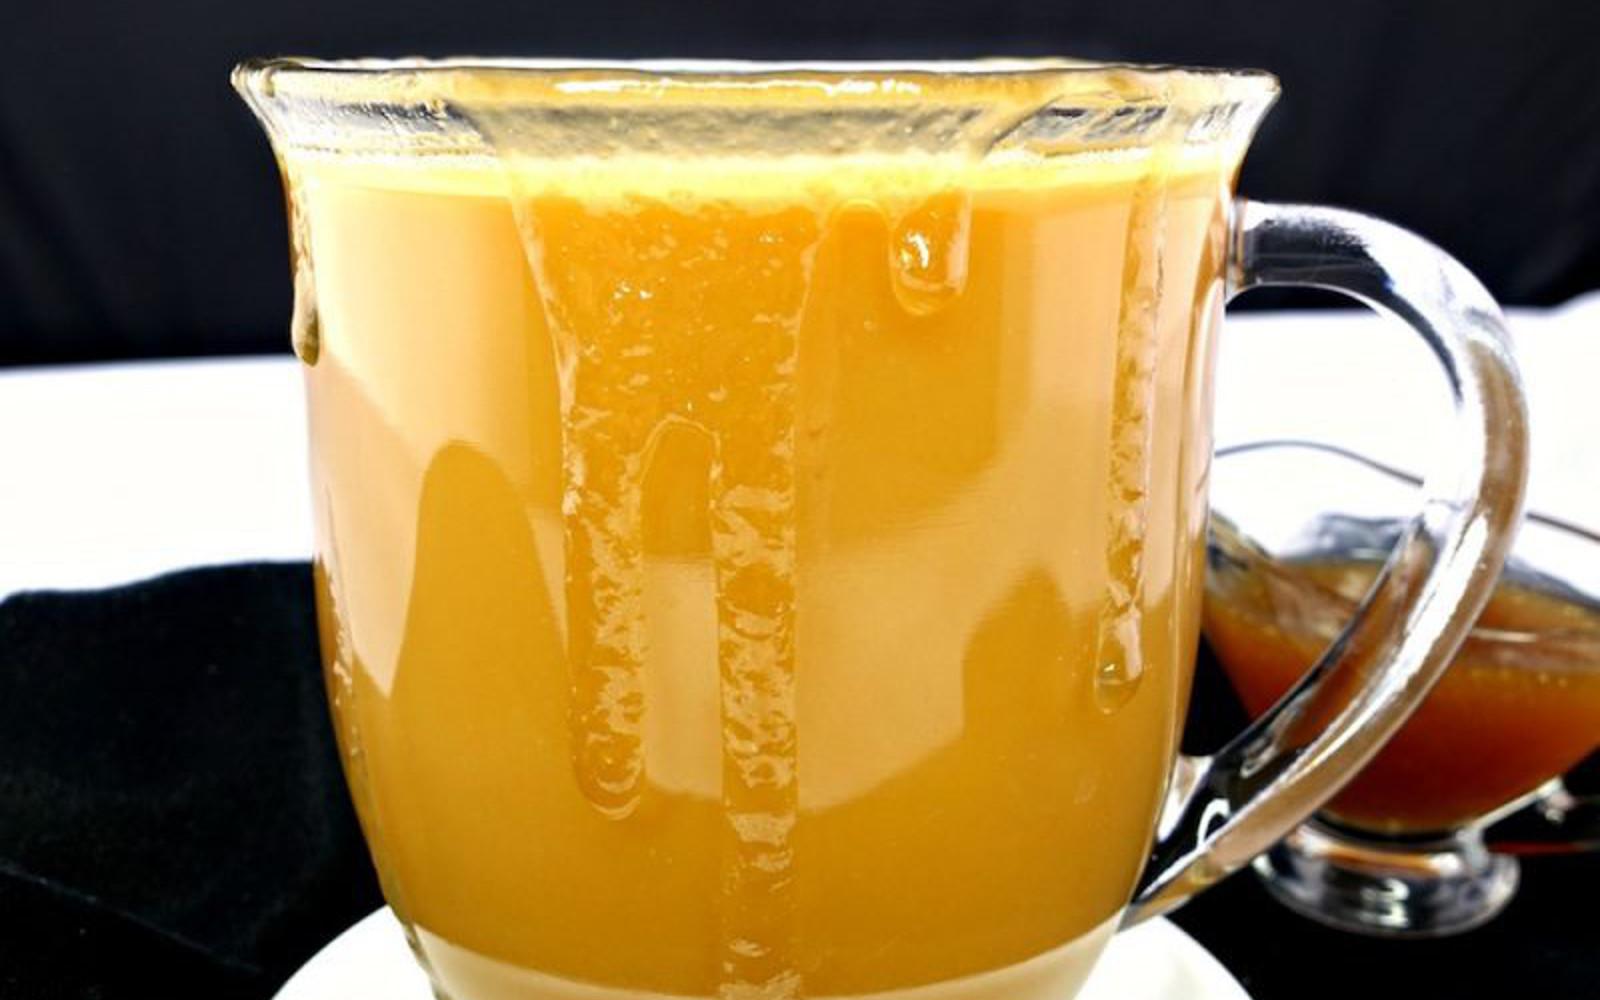 Vegan Gluten-Free Paleo Caramel Macchiato